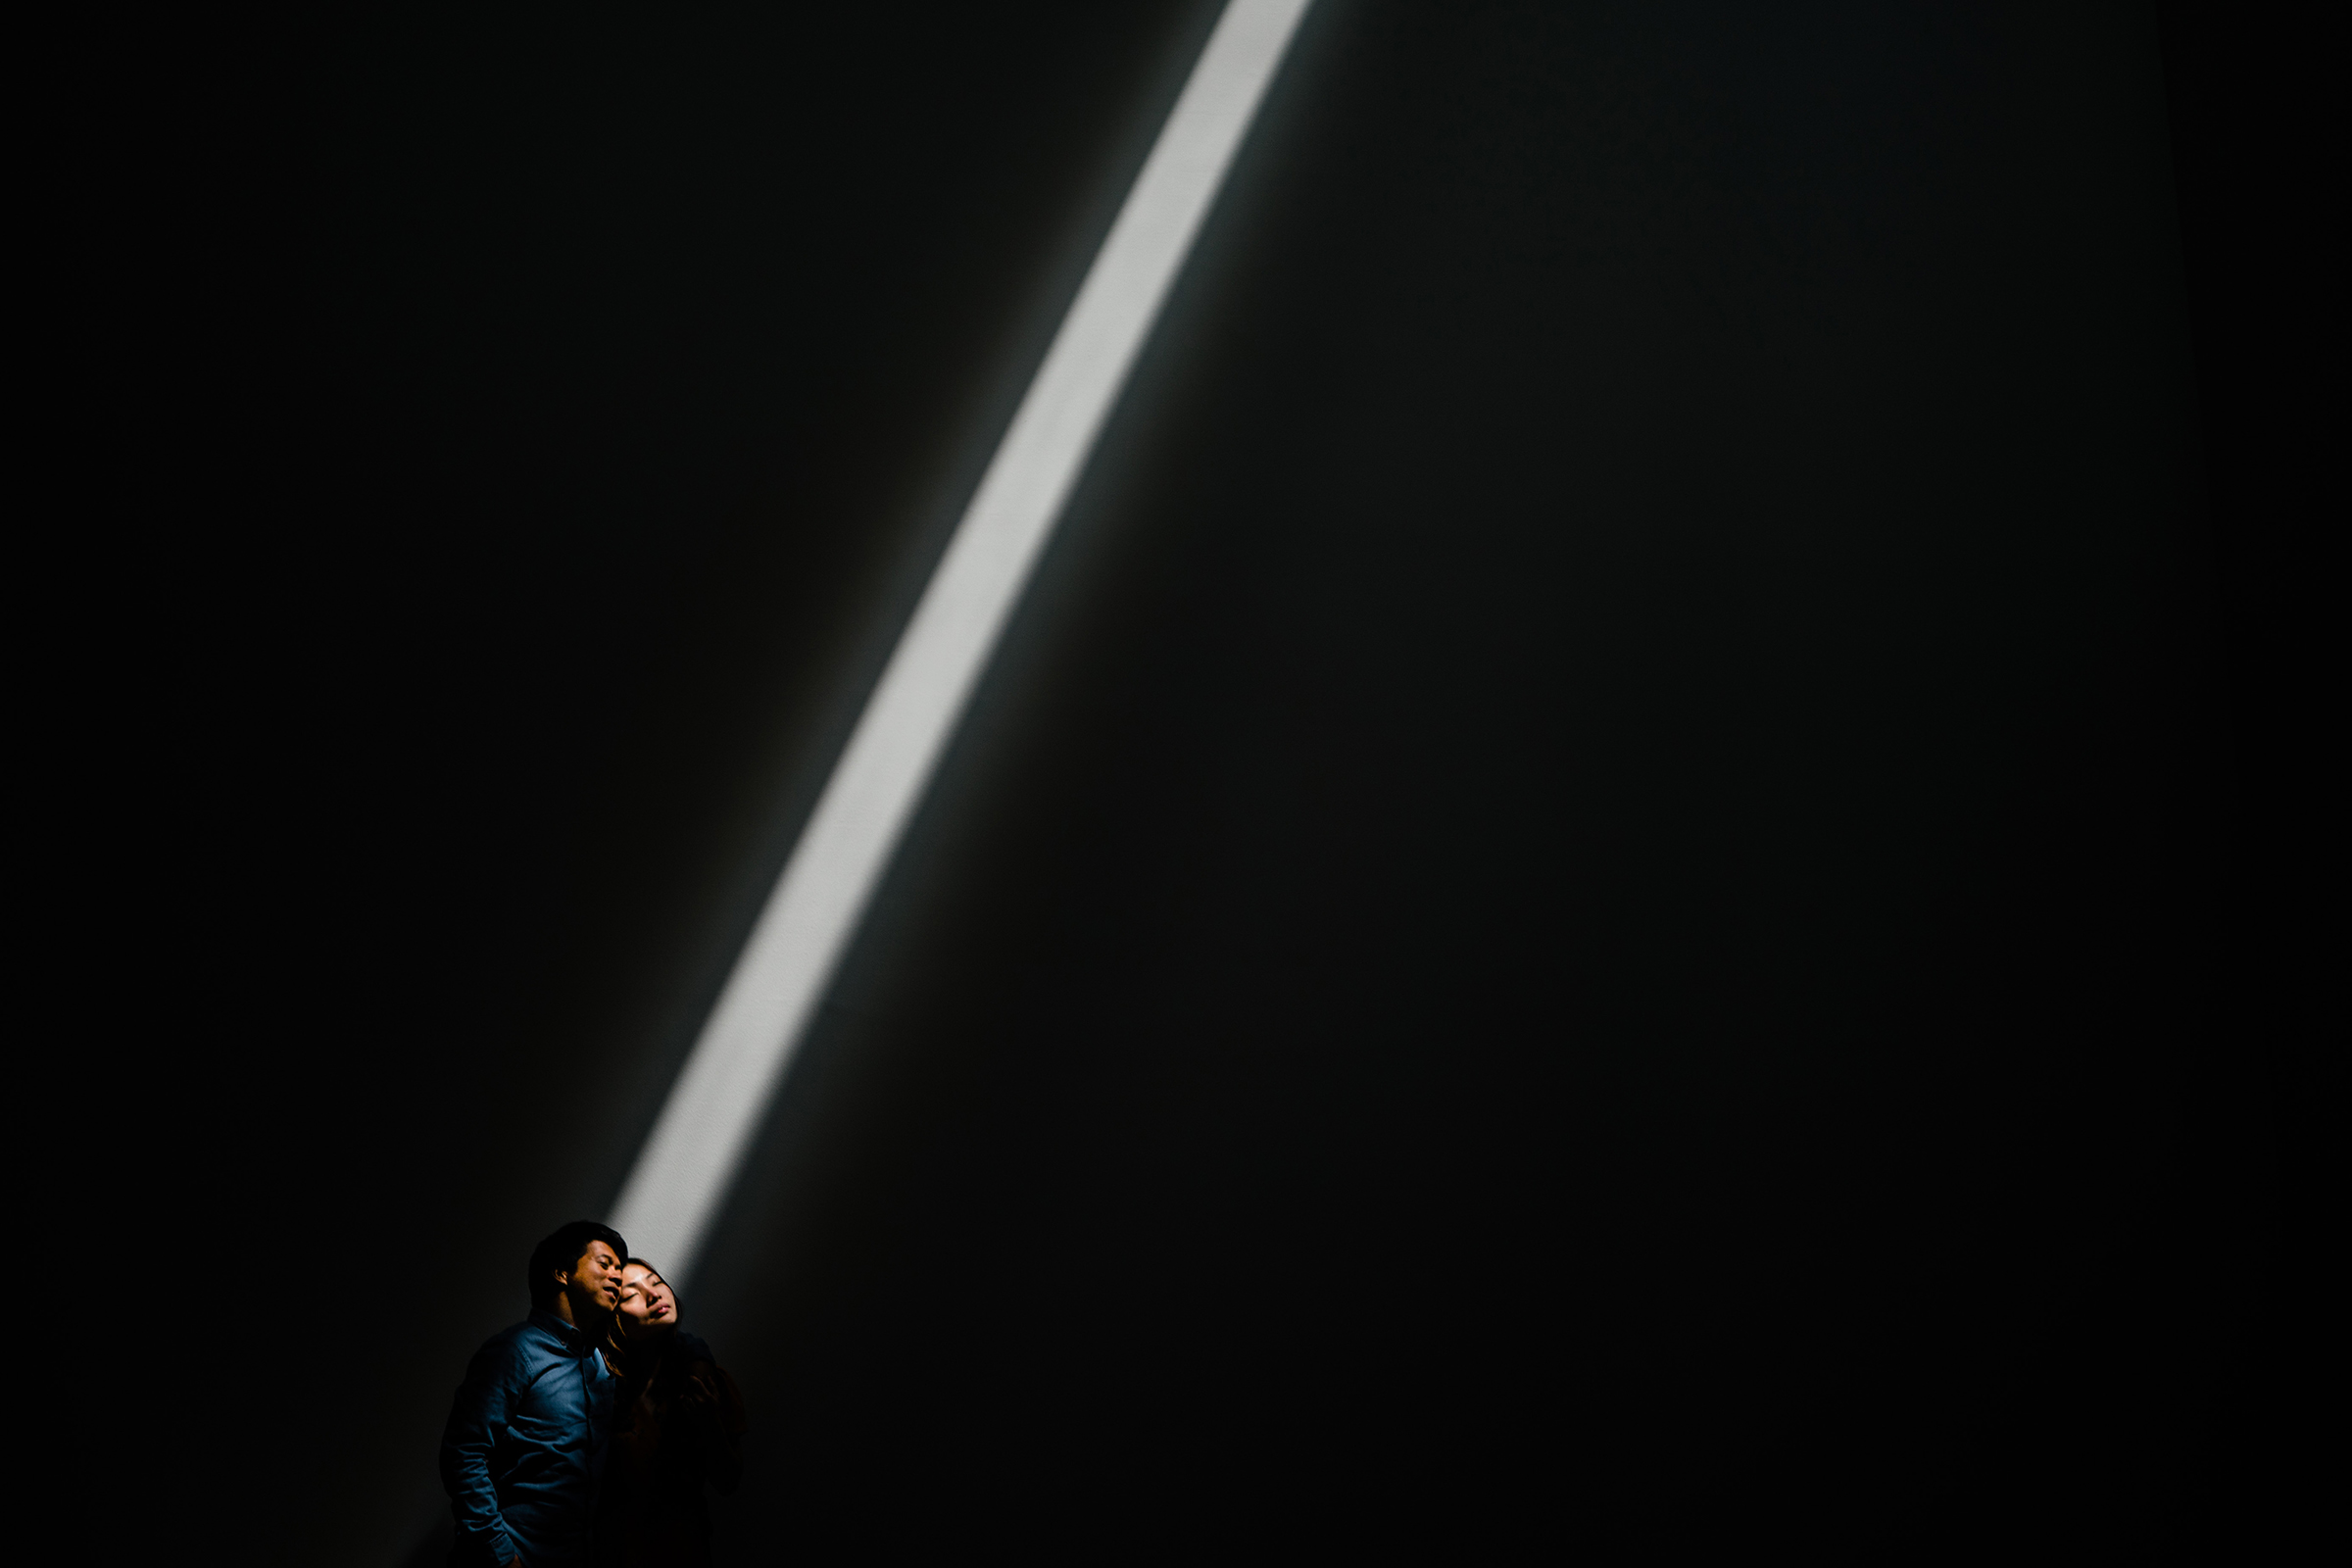 worlds-best-engagement-photos-by-jason-vinson